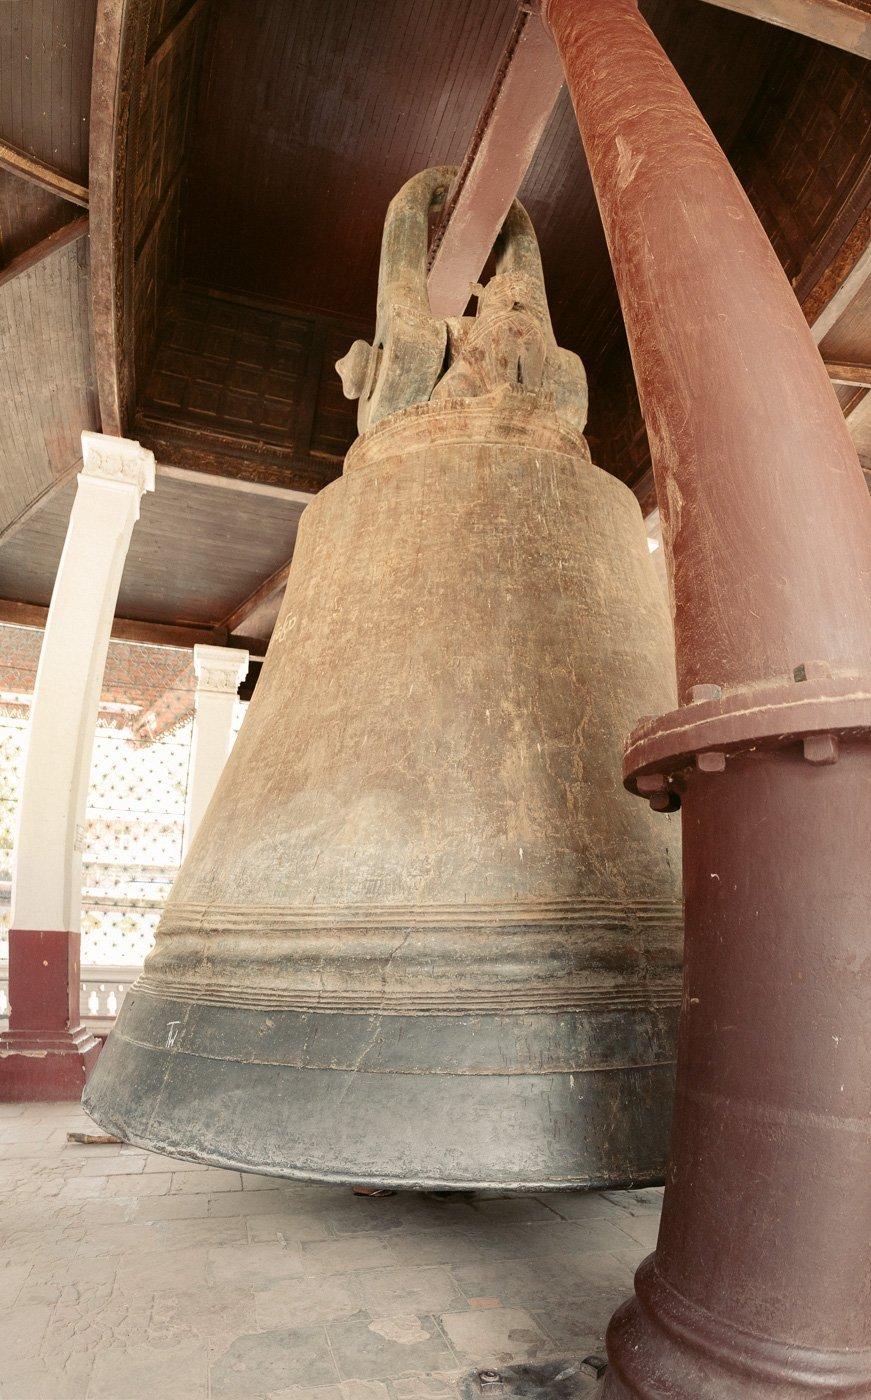 MINGUN BELL, MYANMAR